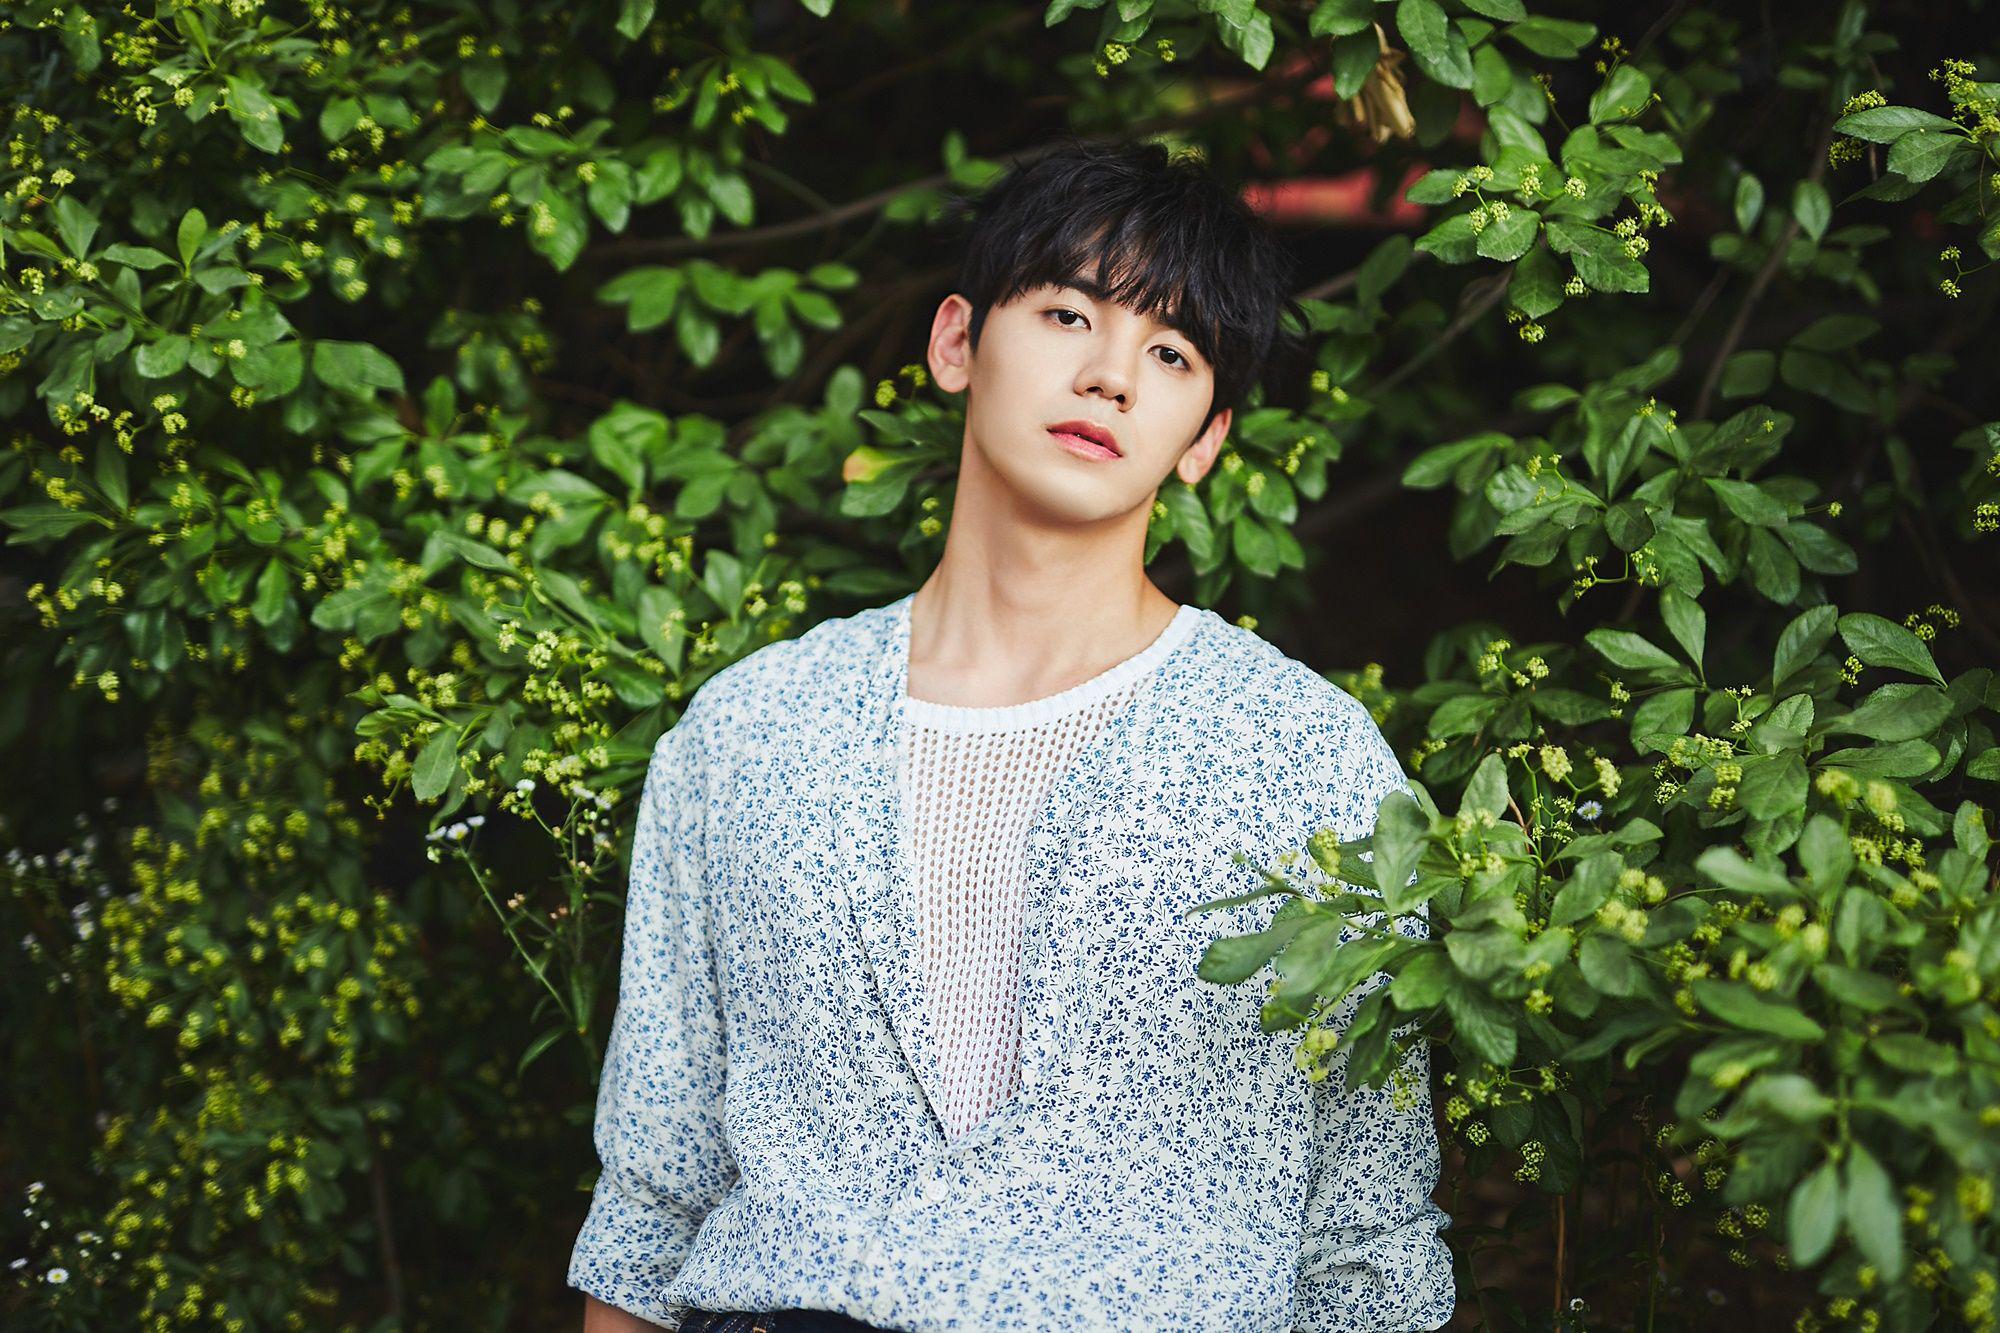 Cheon Seung Ho